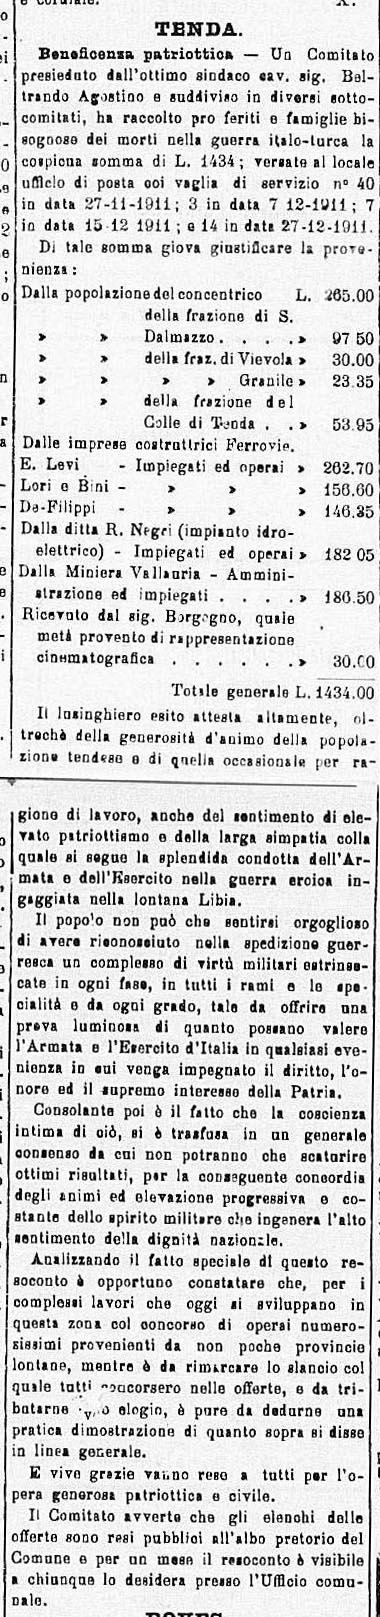 301 du 30 12 1911